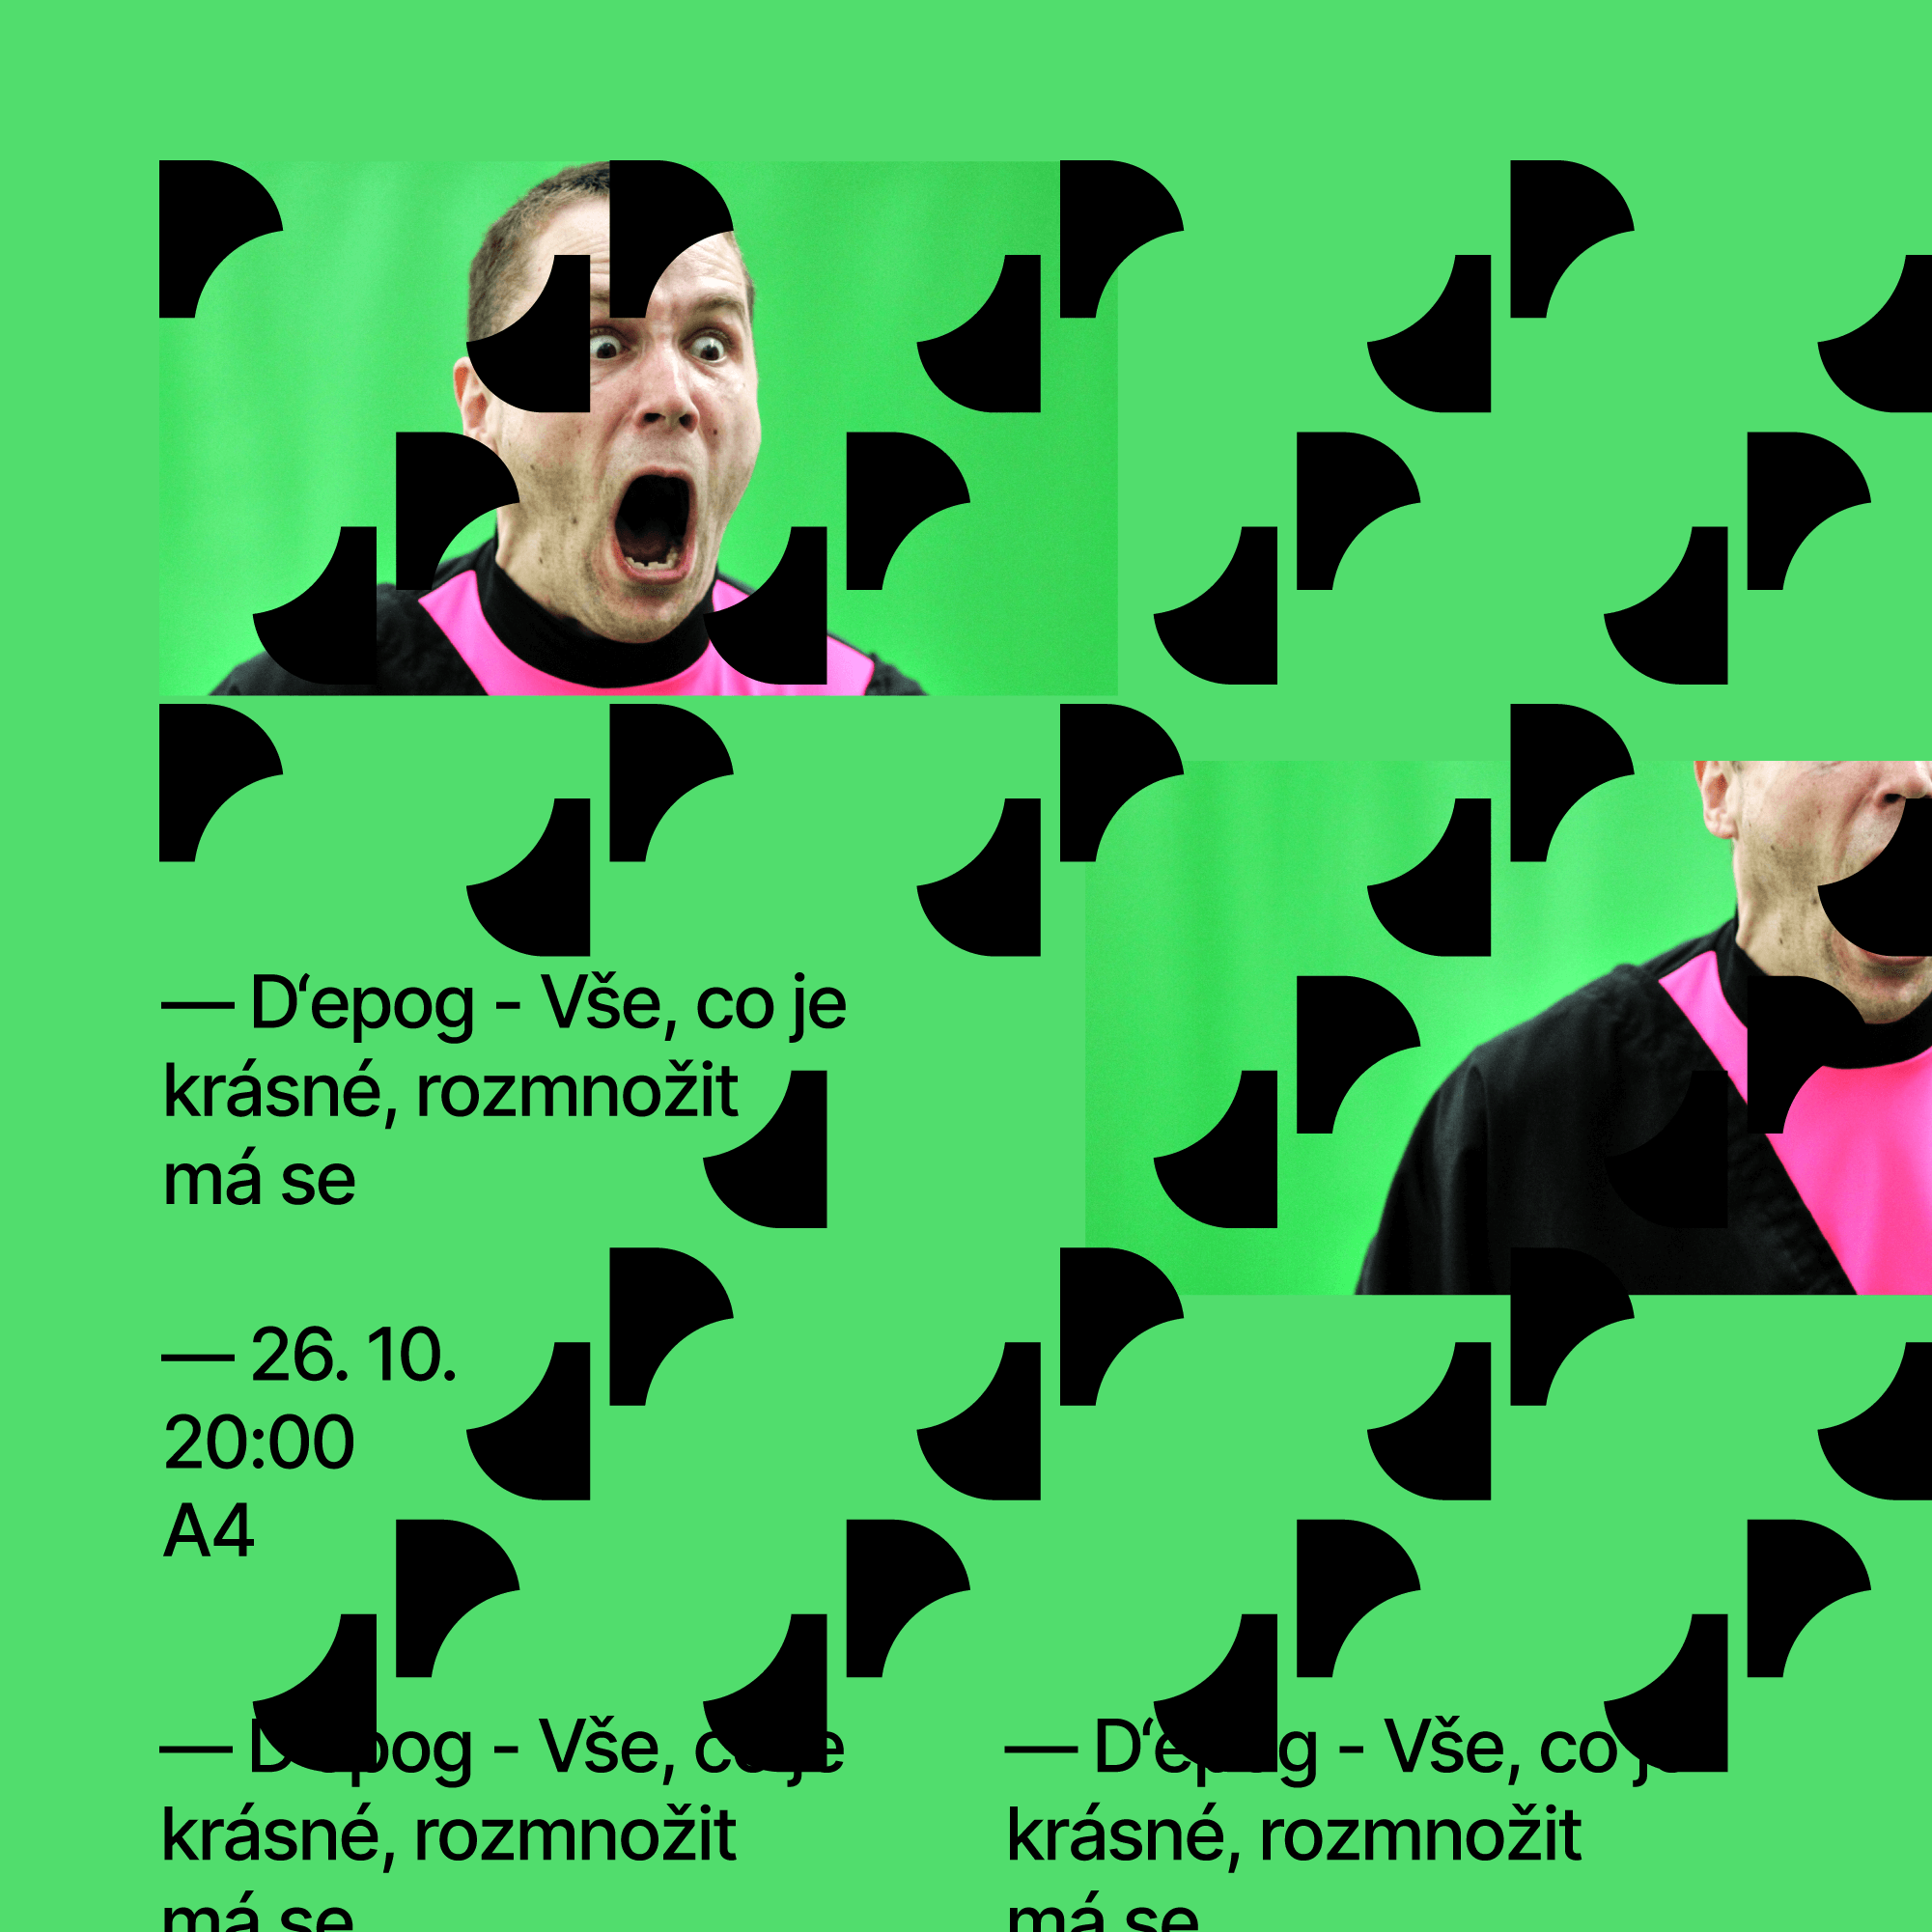 Drama-Queer-Social-v03_DQ-Artist-06-01